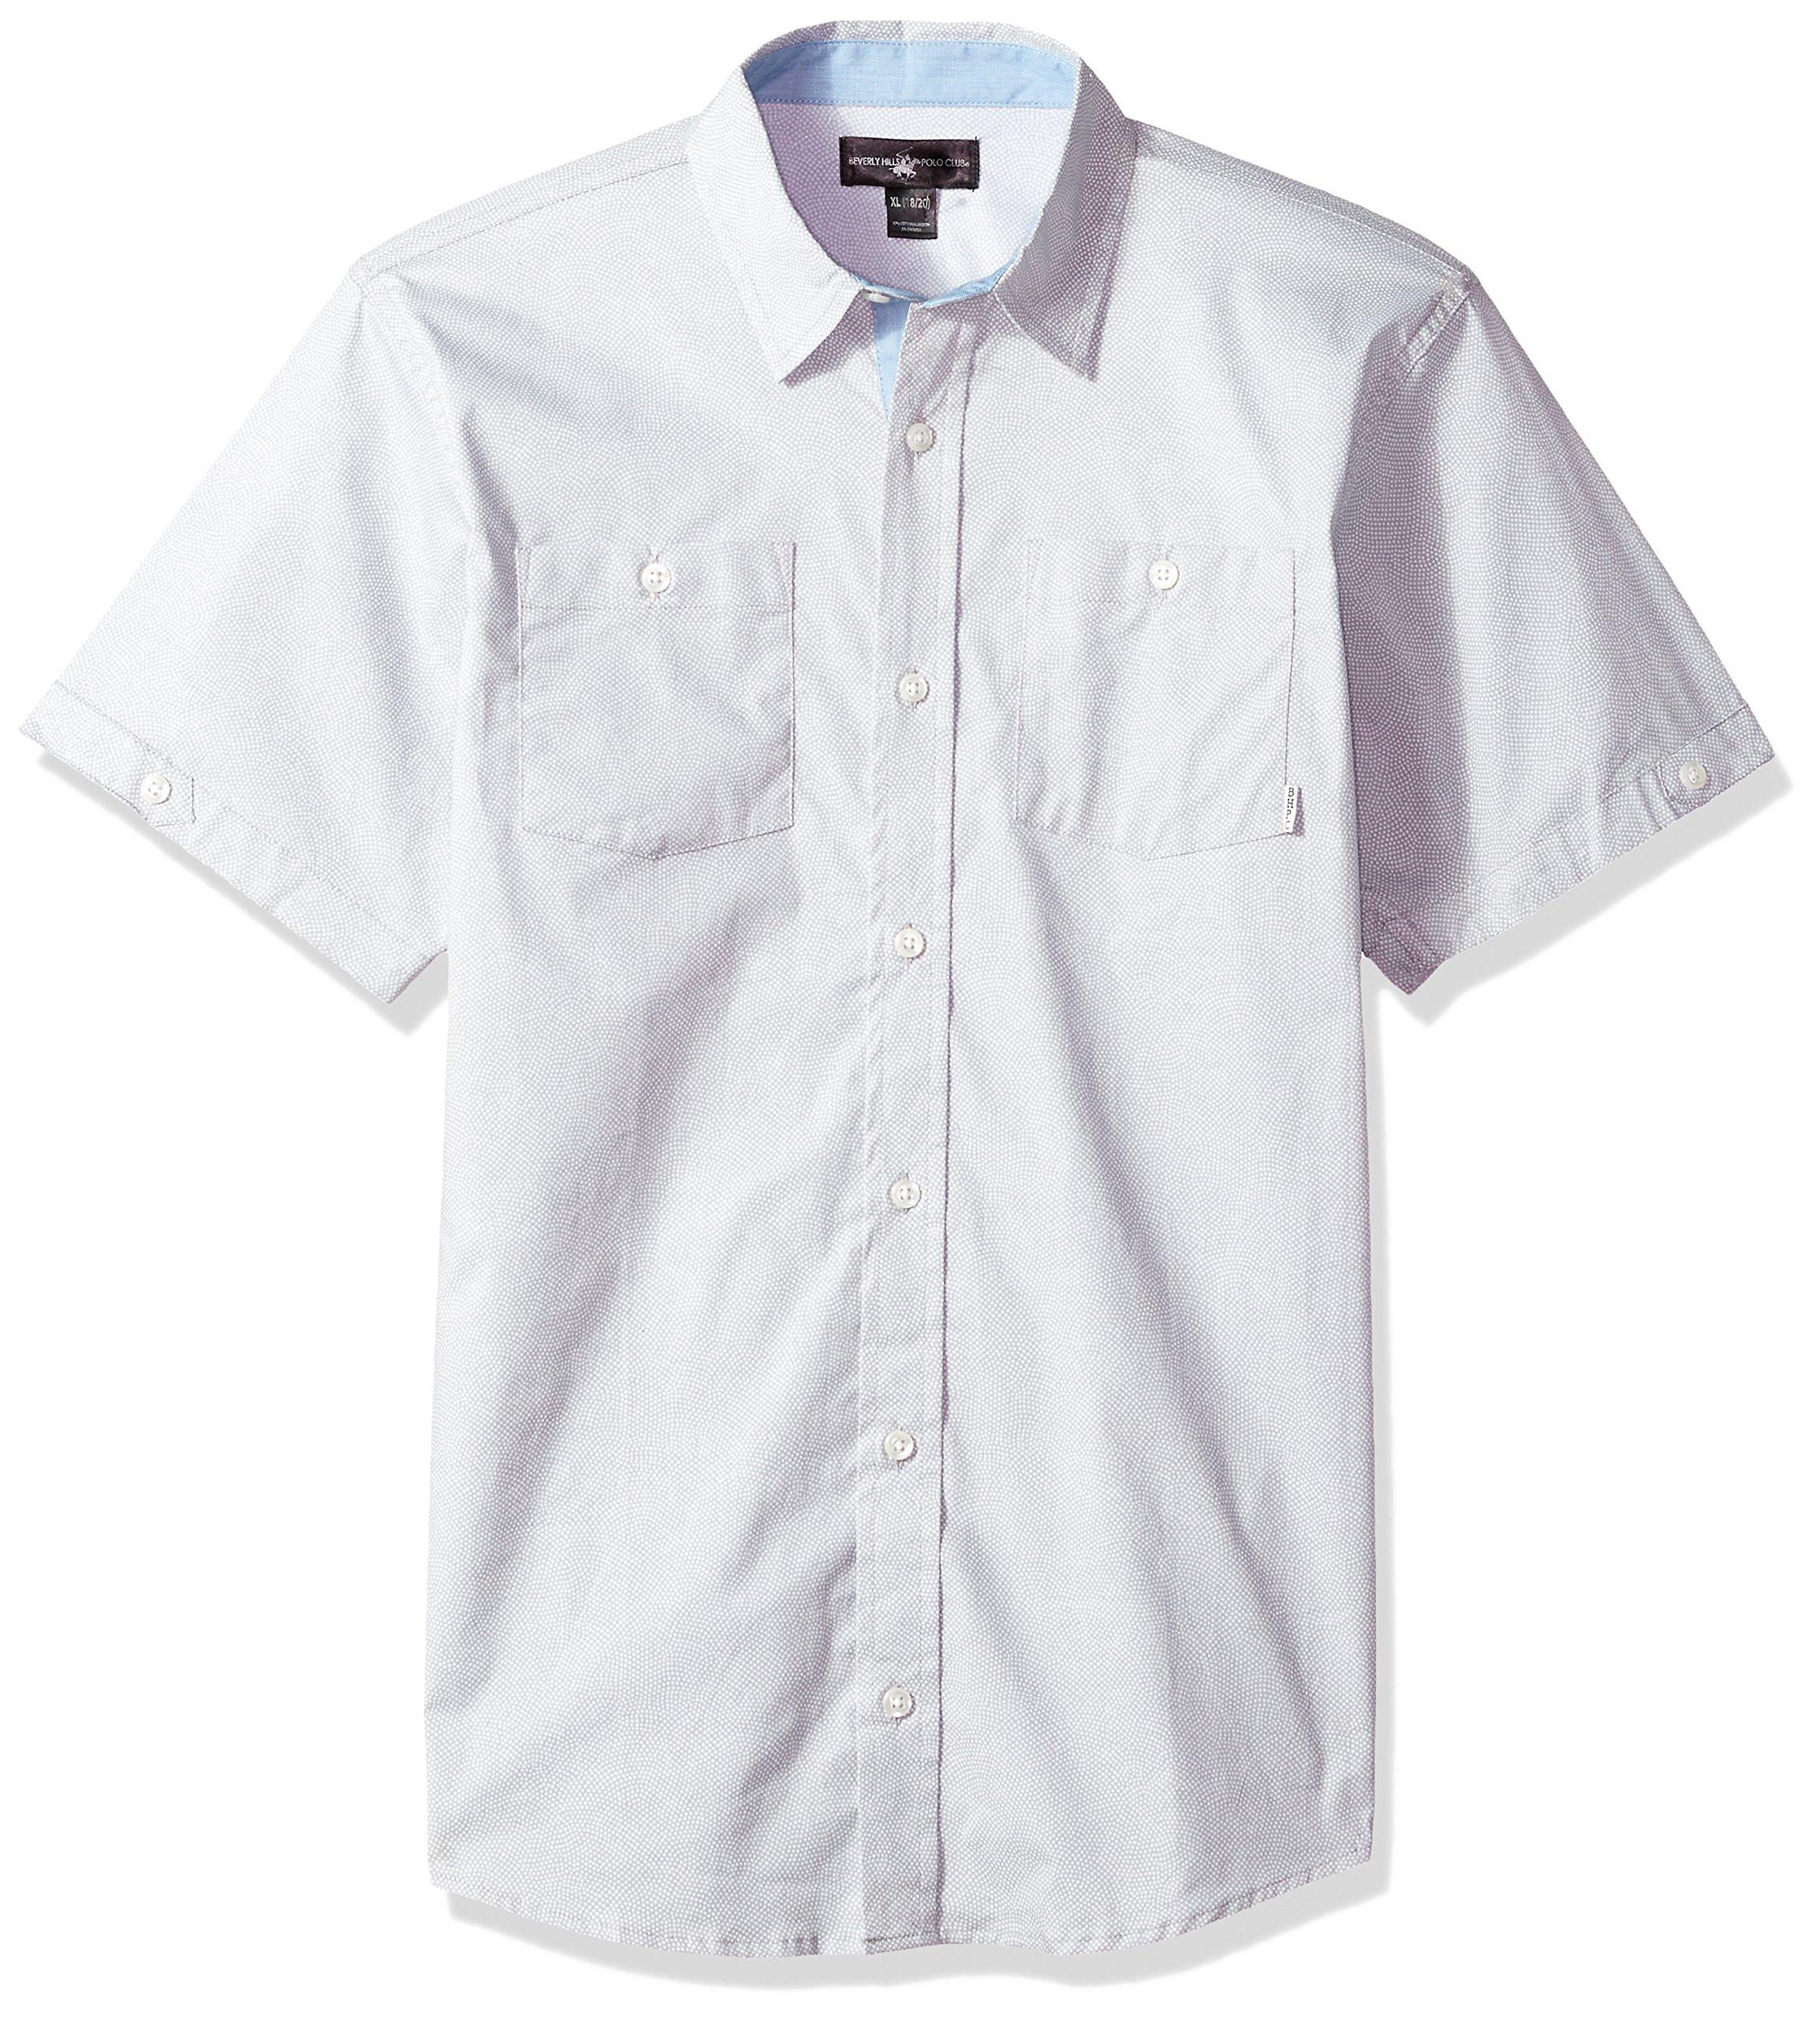 Beverly Hills Polo Club Big Boys' Short Sleeve Shirt, Grey, 14/16